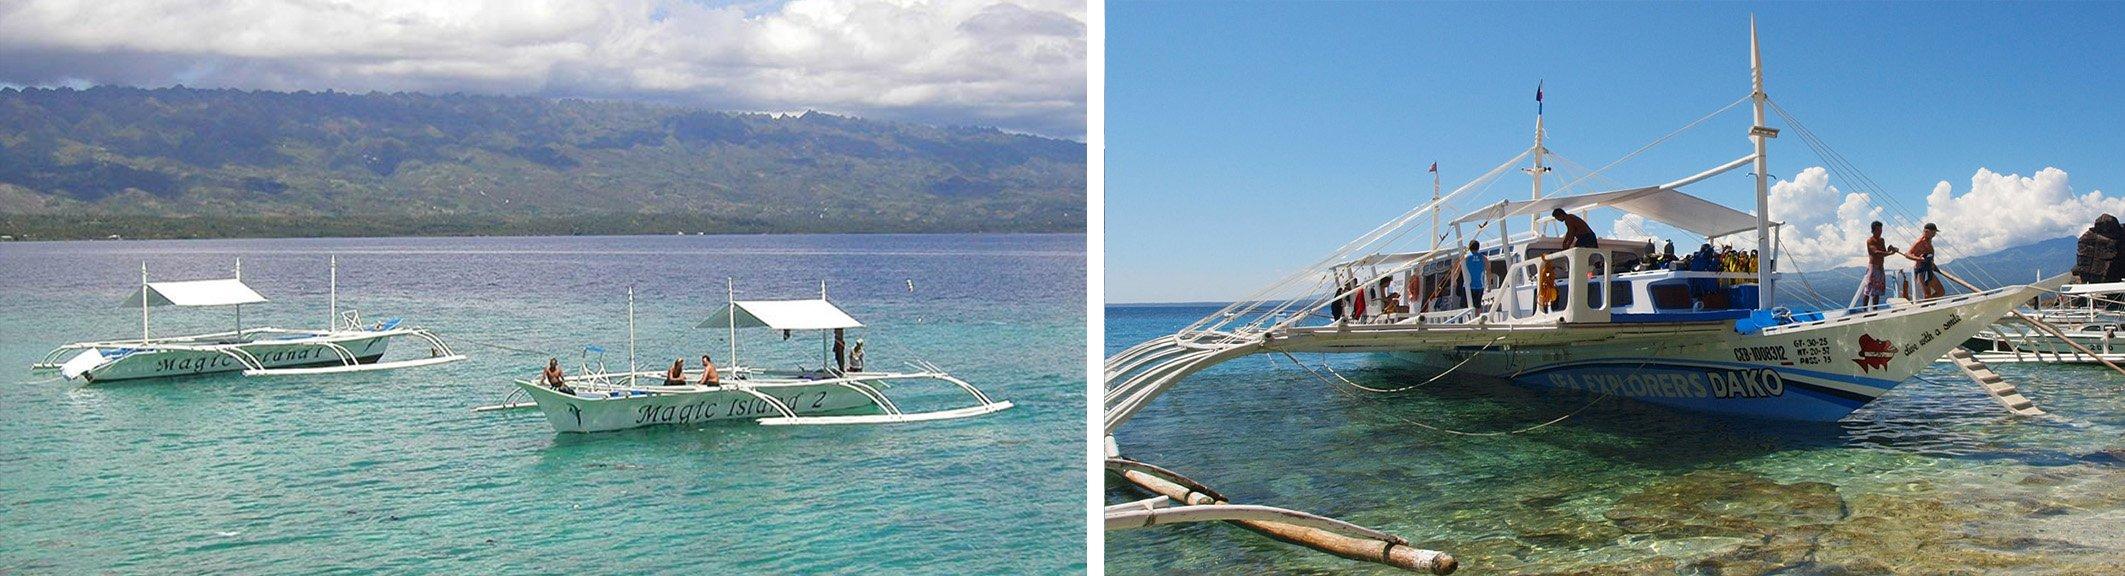 Magic Island and Sea Explorers Snorkel Boats